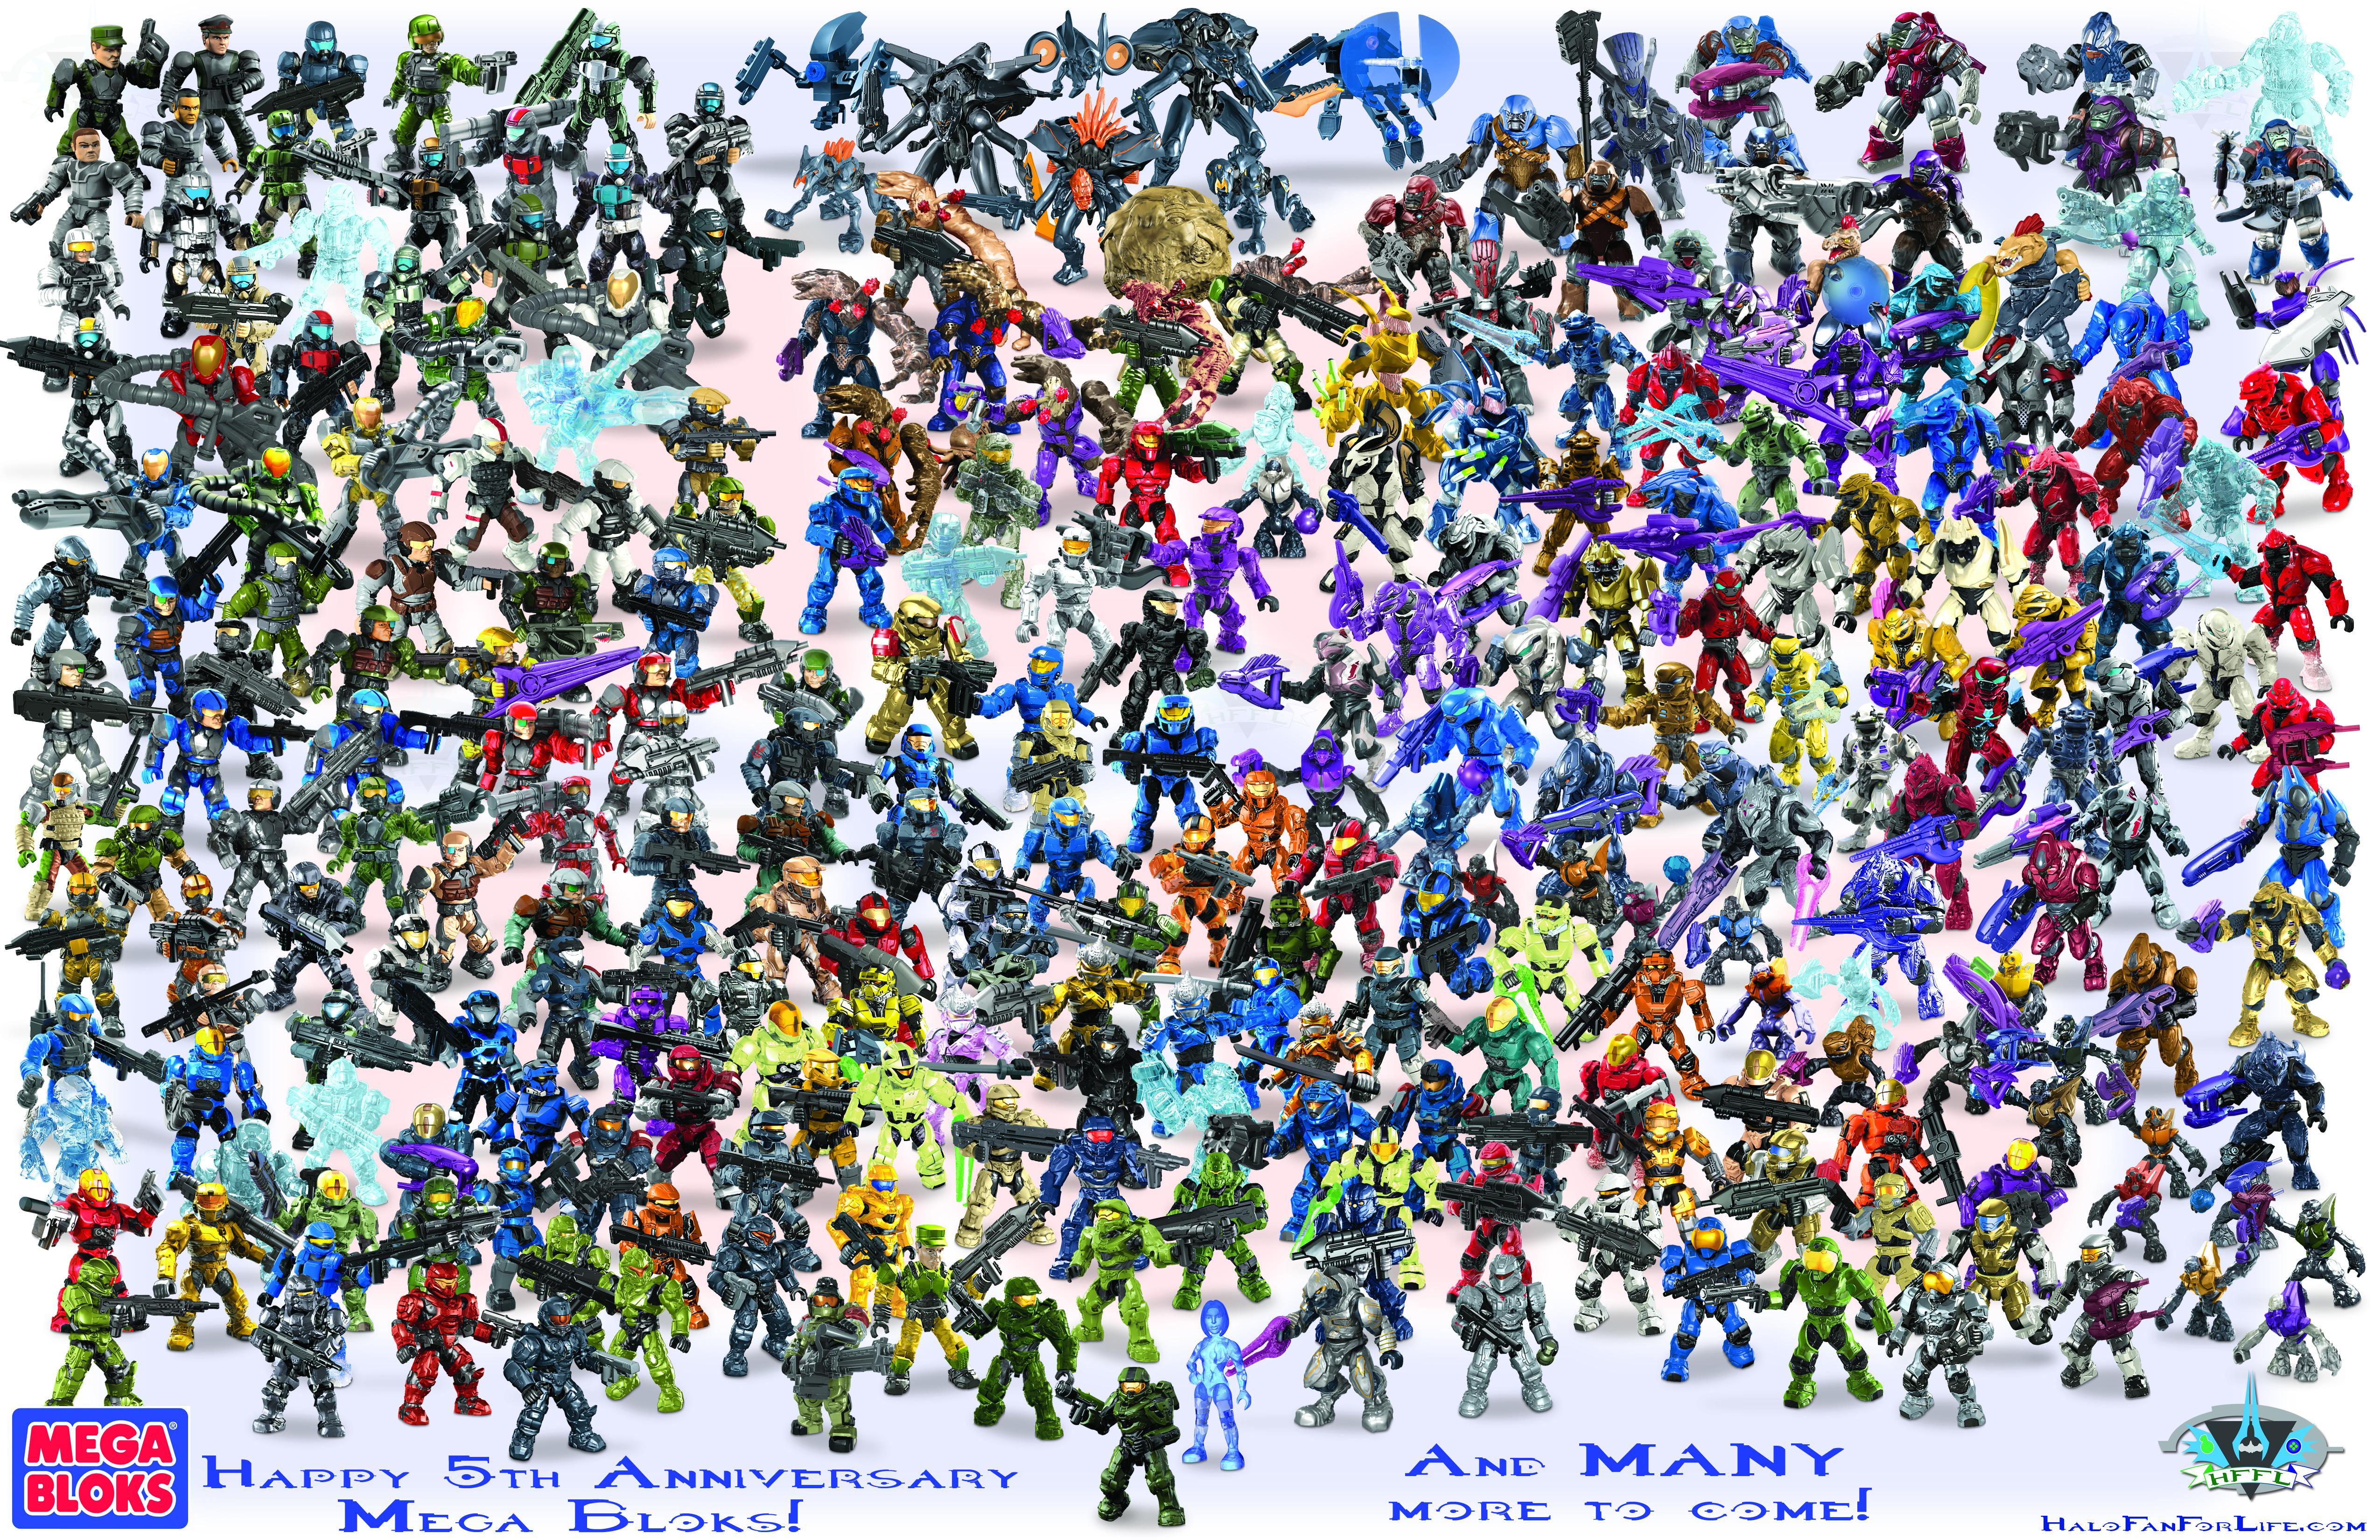 [Bild: Halo-Mega-Bloks-5th-anni-MINIFIGS.jpg]